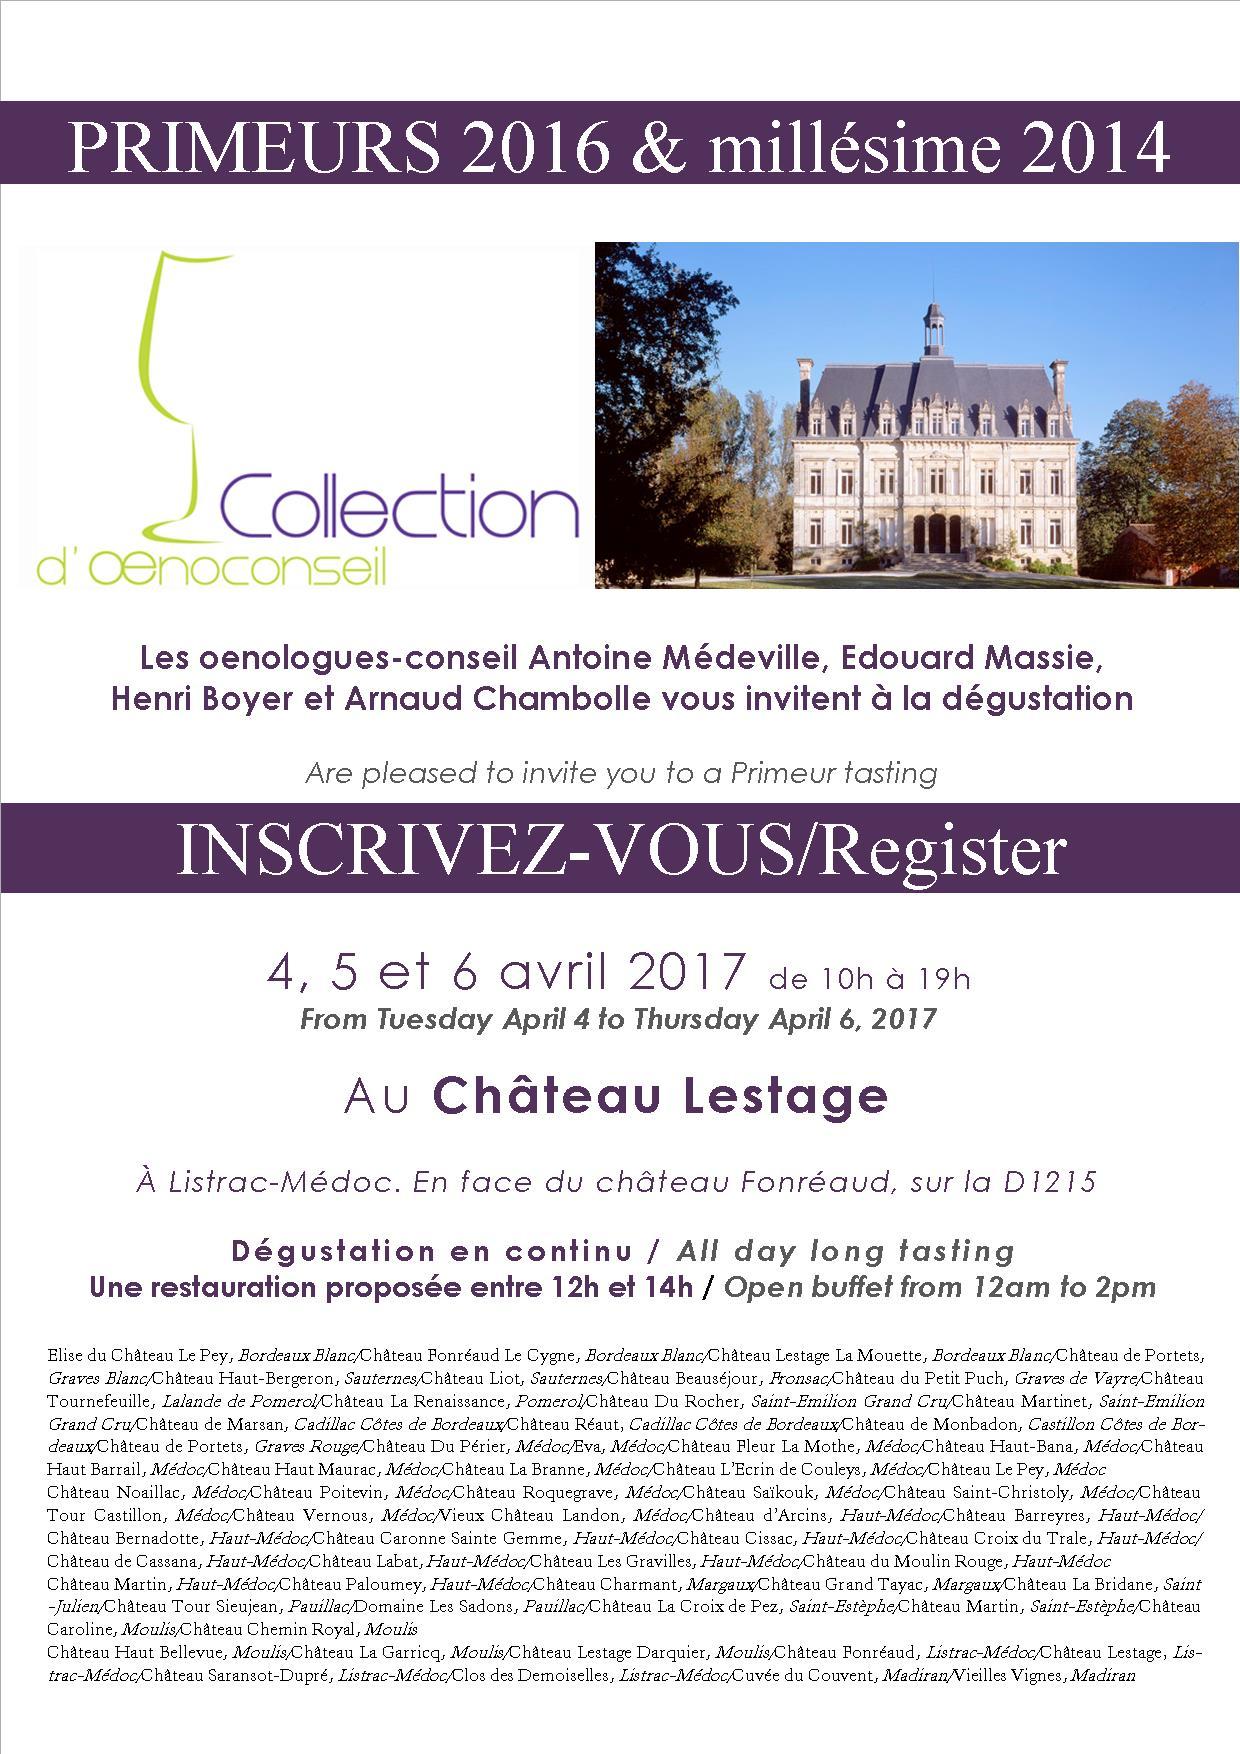 Invitation Primeur 2017 Collection d'Oenoconseil